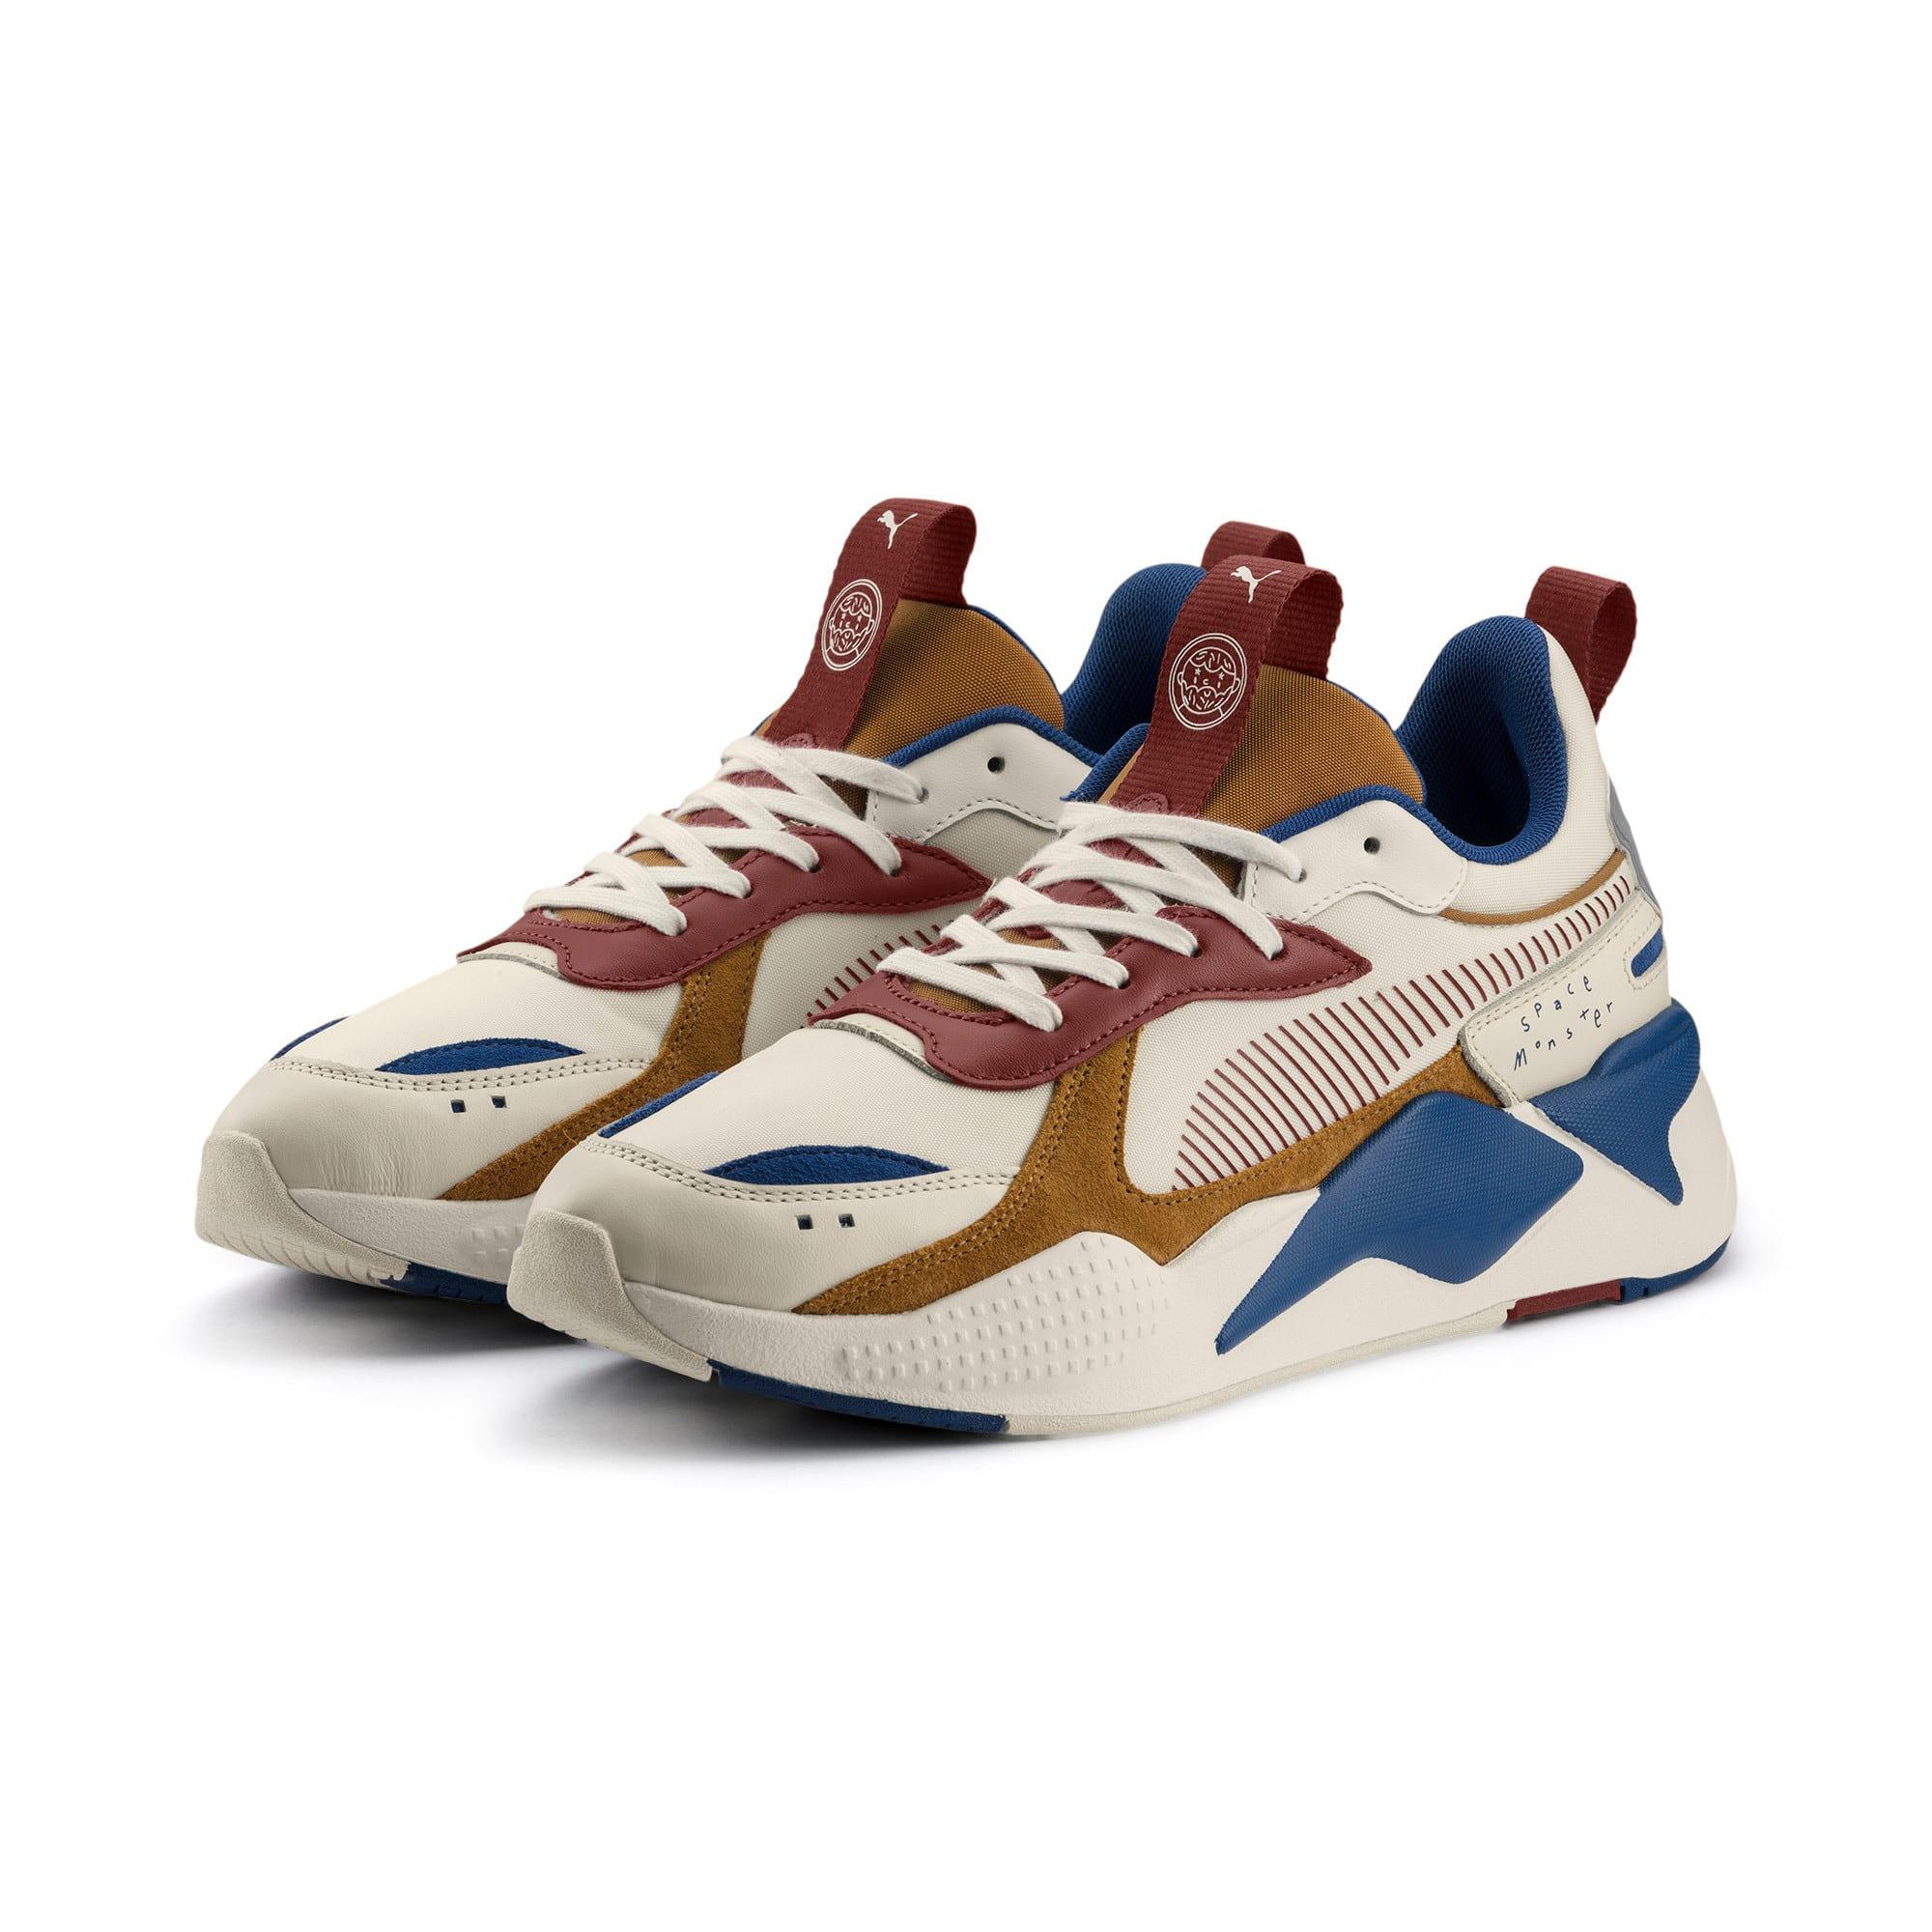 Miniatura 4 de Zapatos deportivos PUMA x TYAKASHA RS-X, Whisper White-Fired Brick, mediano